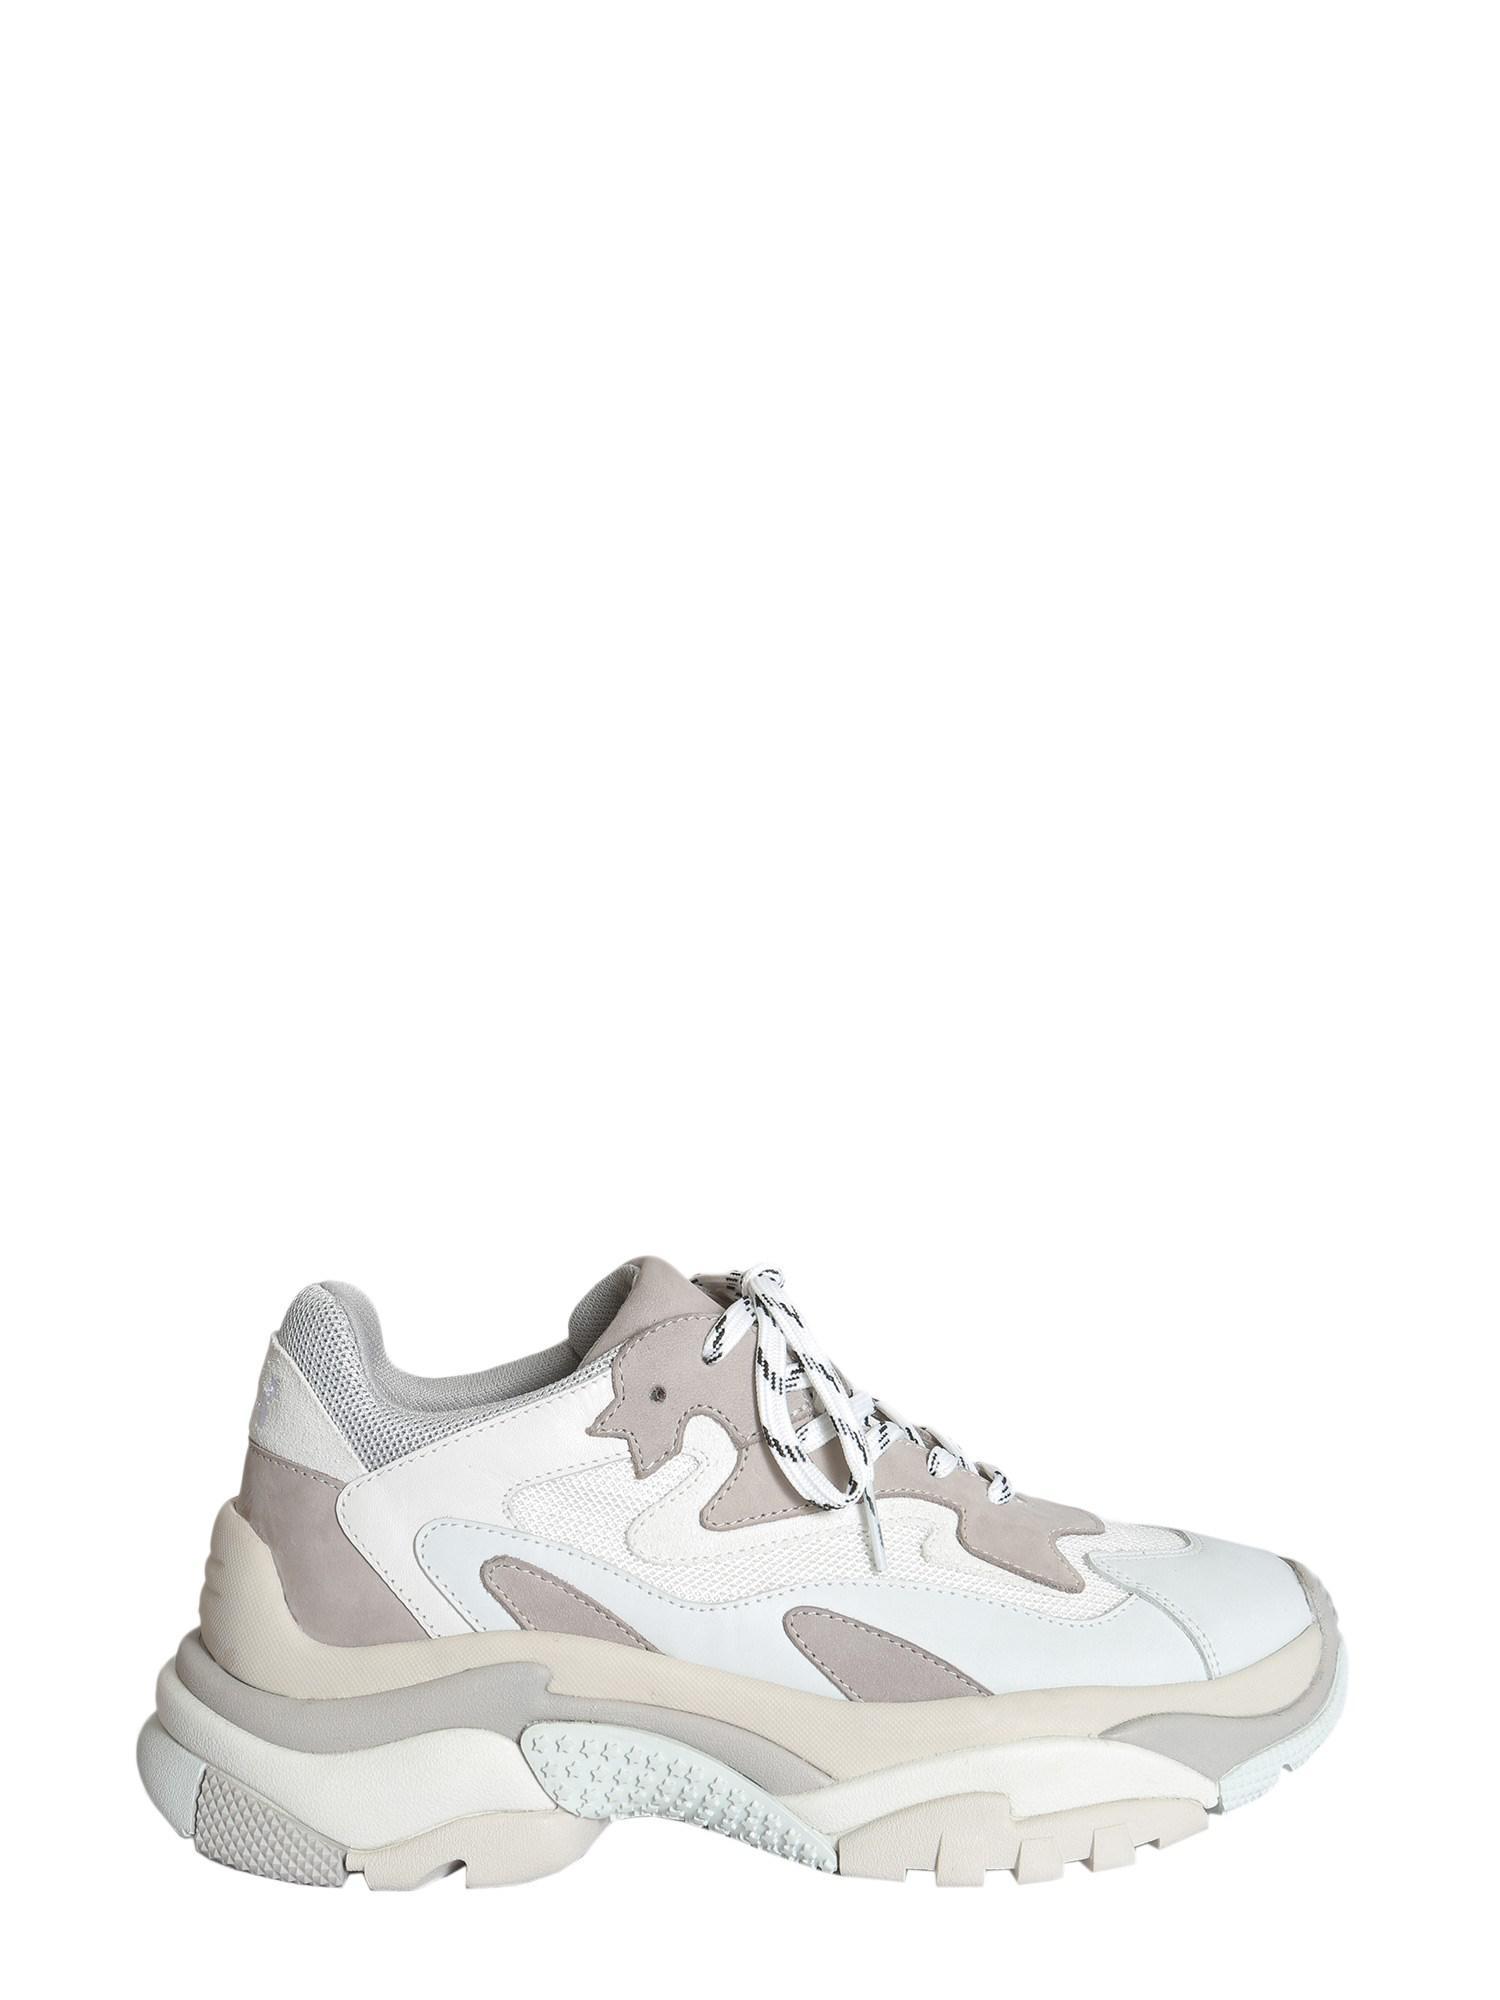 Ash Addict o6 sneakers SH2VdH7lpb